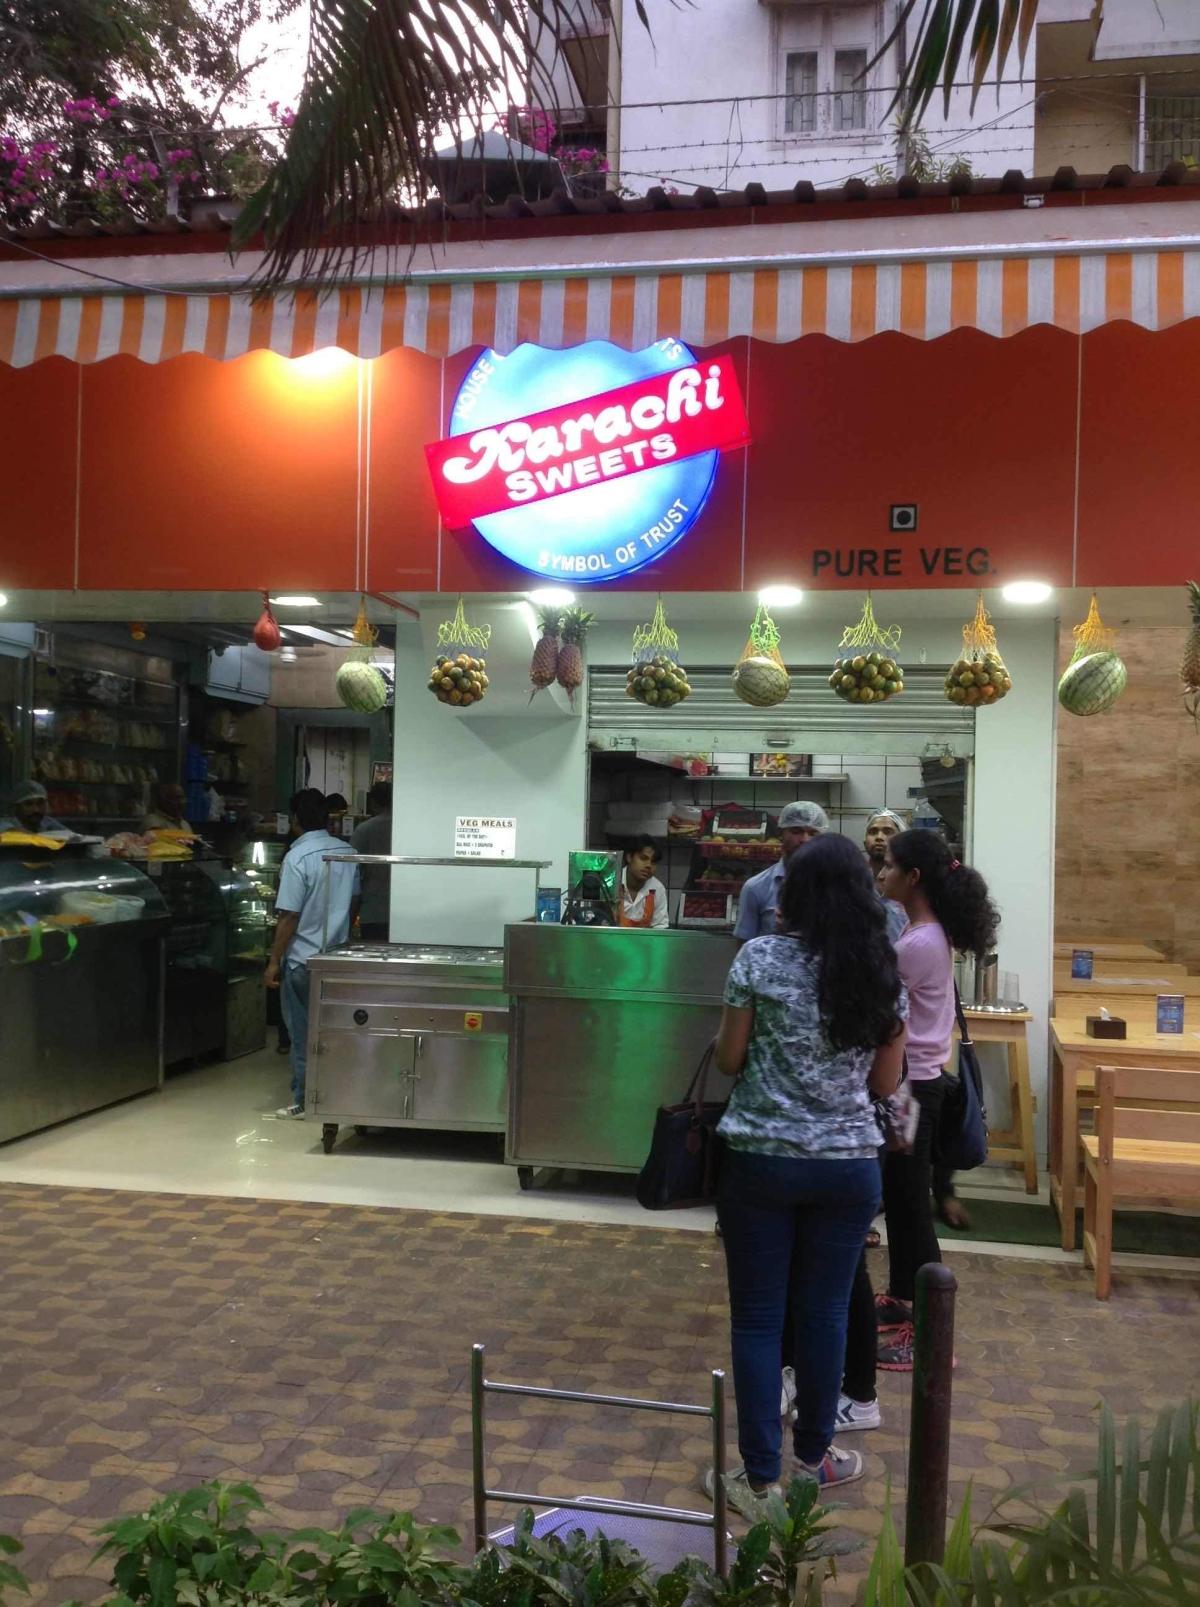 Bandra's Karachi Sweets faces Sena workers' wrath